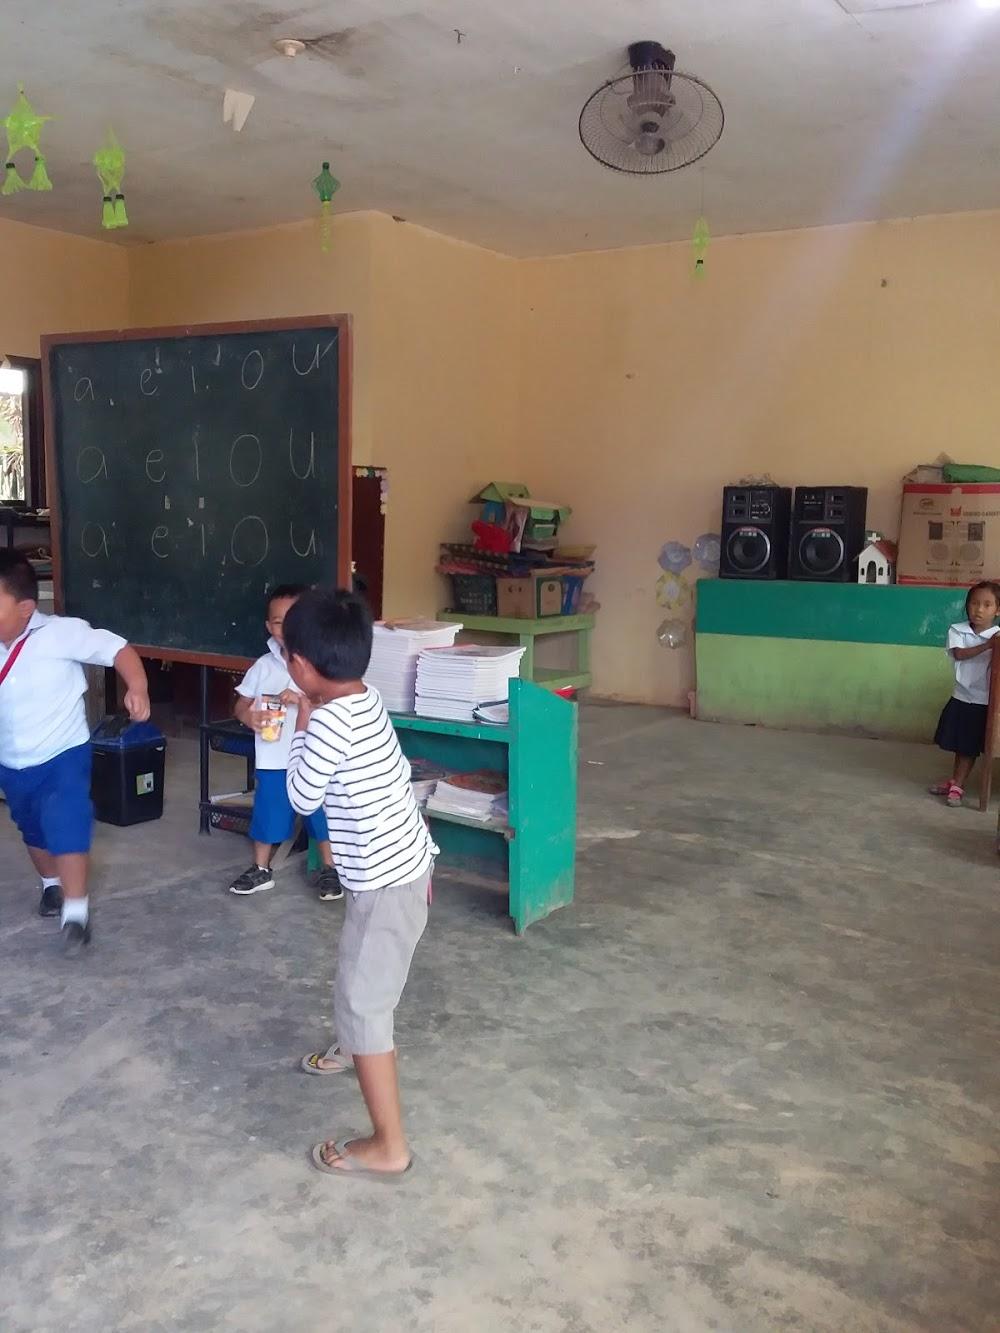 Barangay Villa Libertad Brgy. Hall